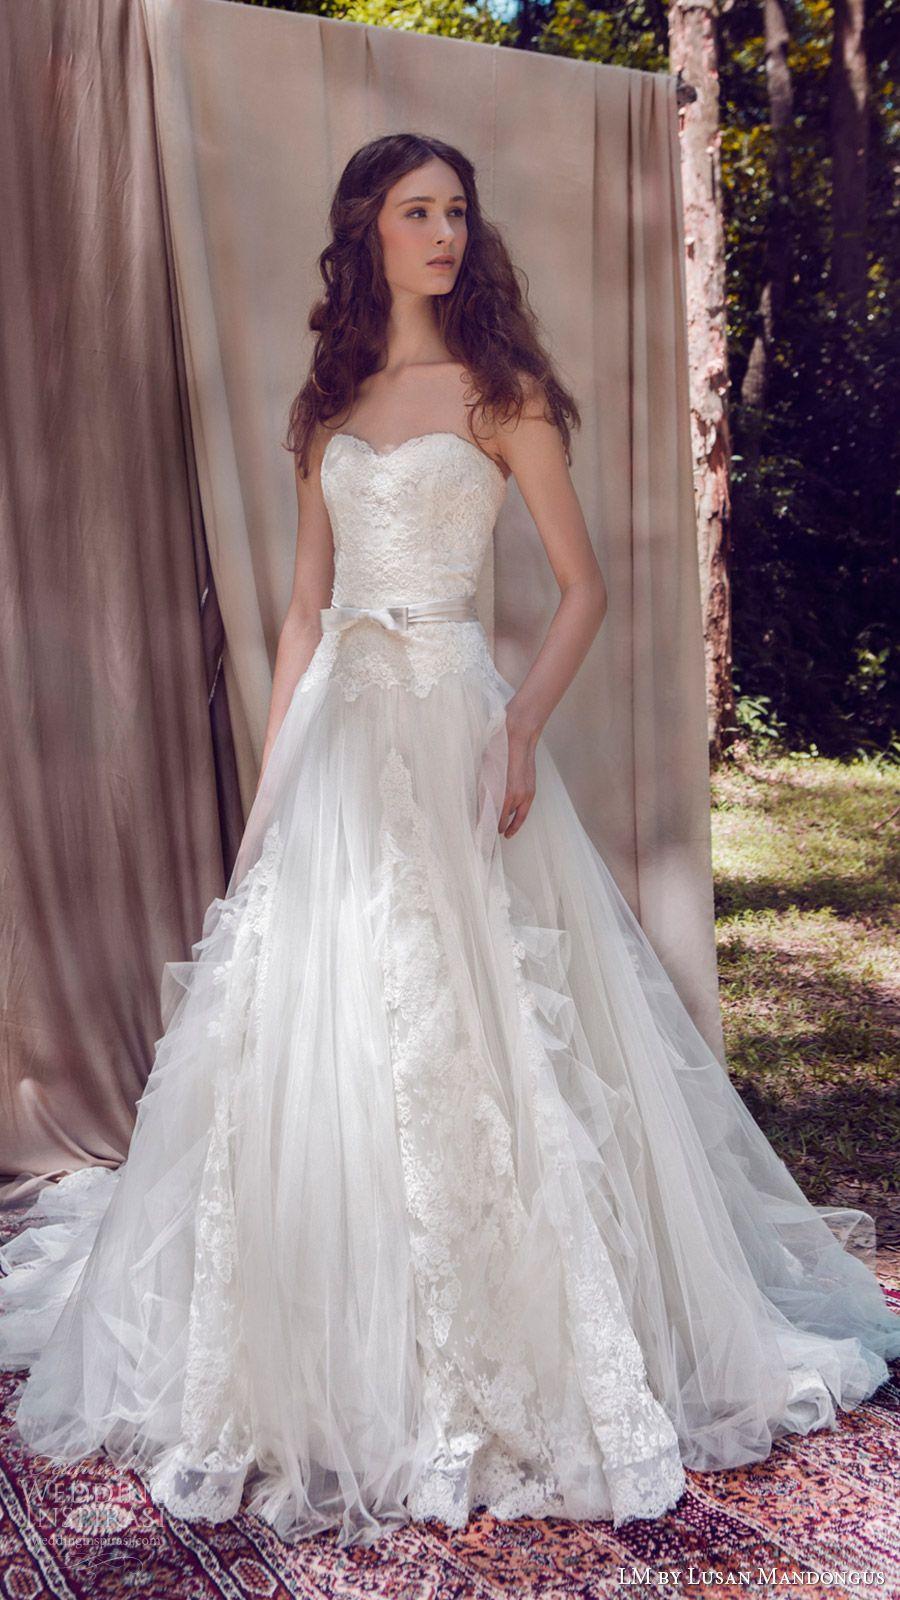 LM by Lusan Mandongus 2017 Wedding Dresses | Juntos para siempre ...